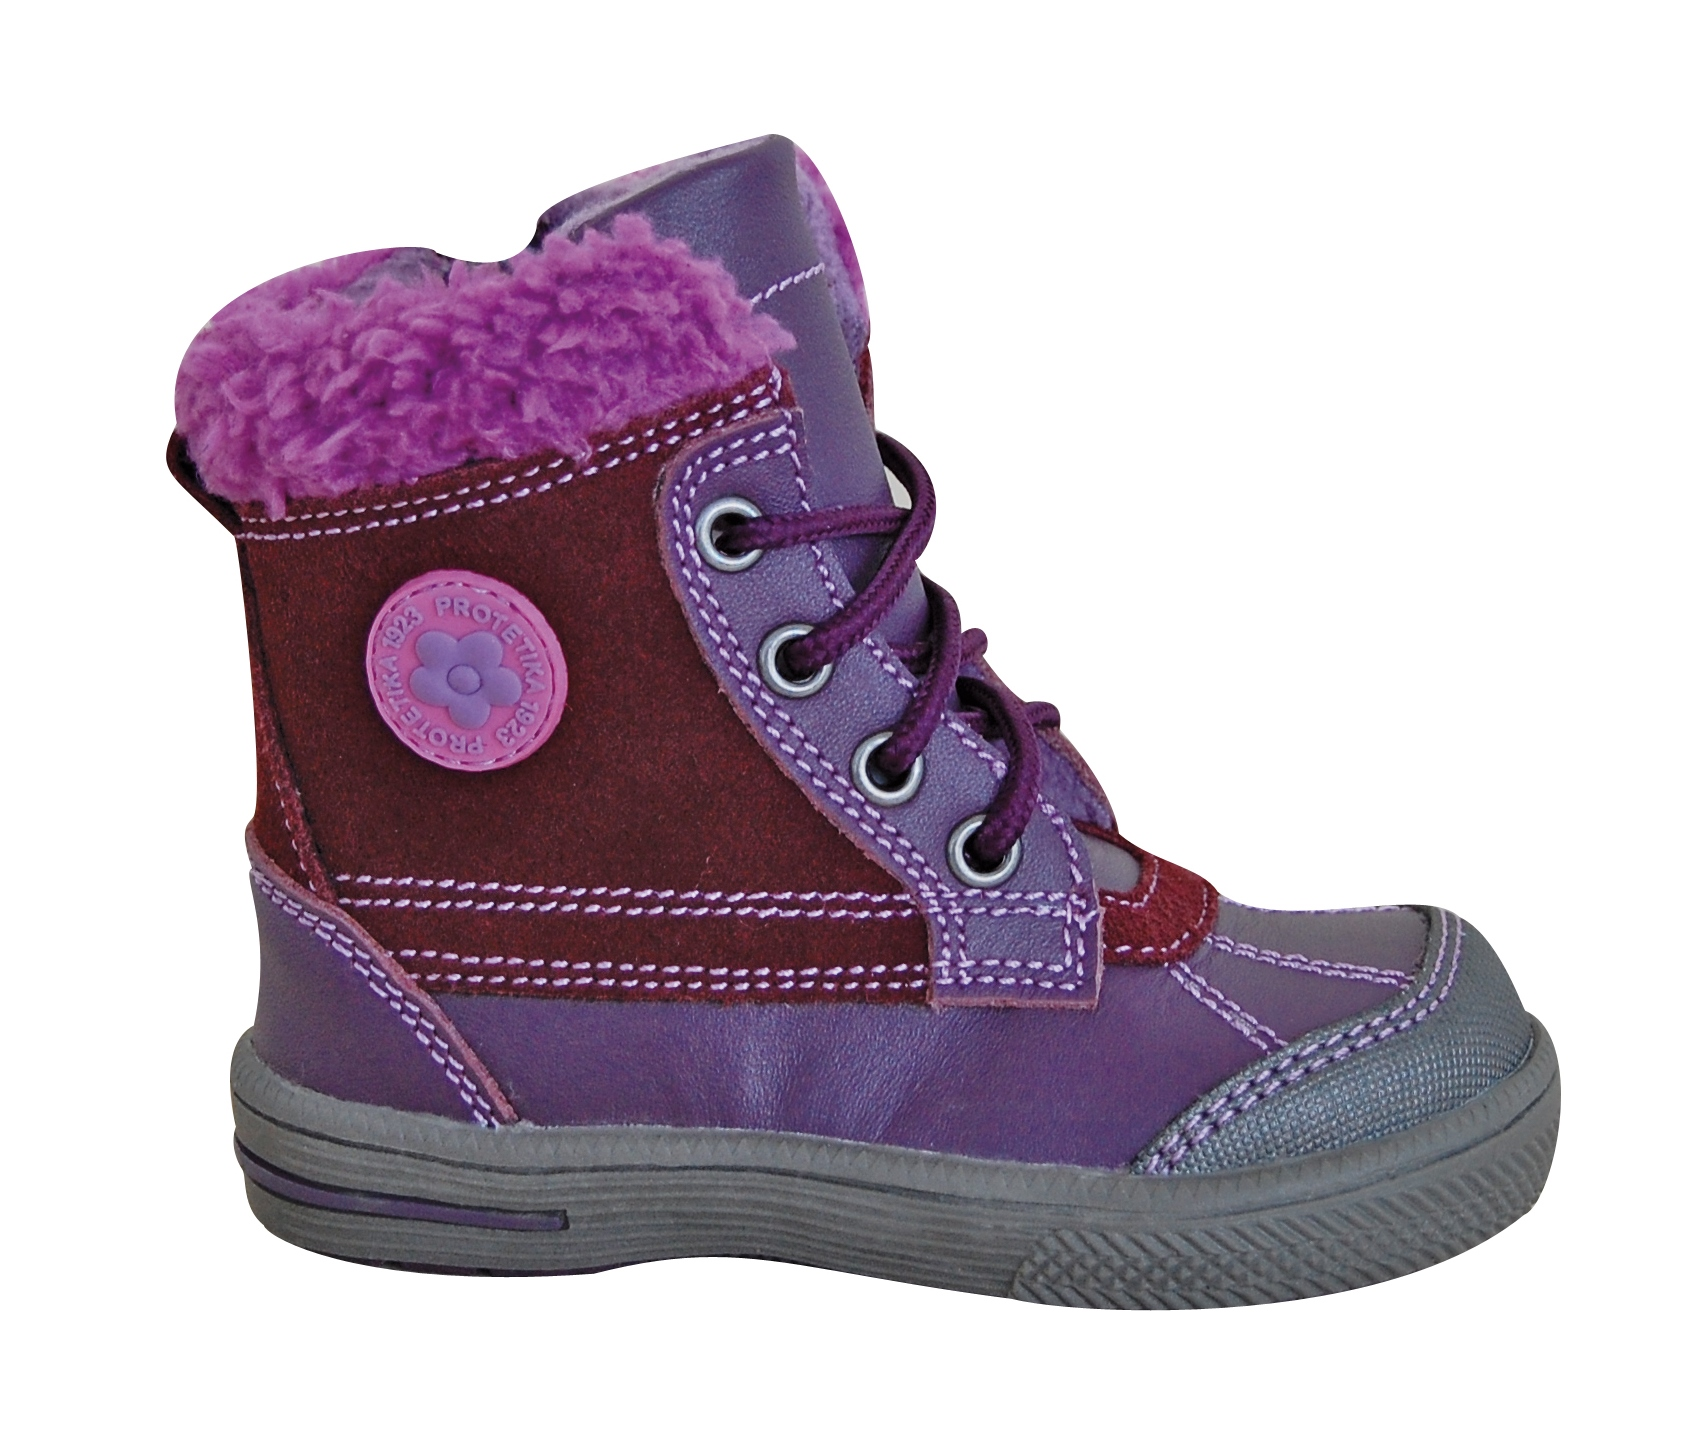 fbfd807b6282 Zimná obuv KERN purple empty